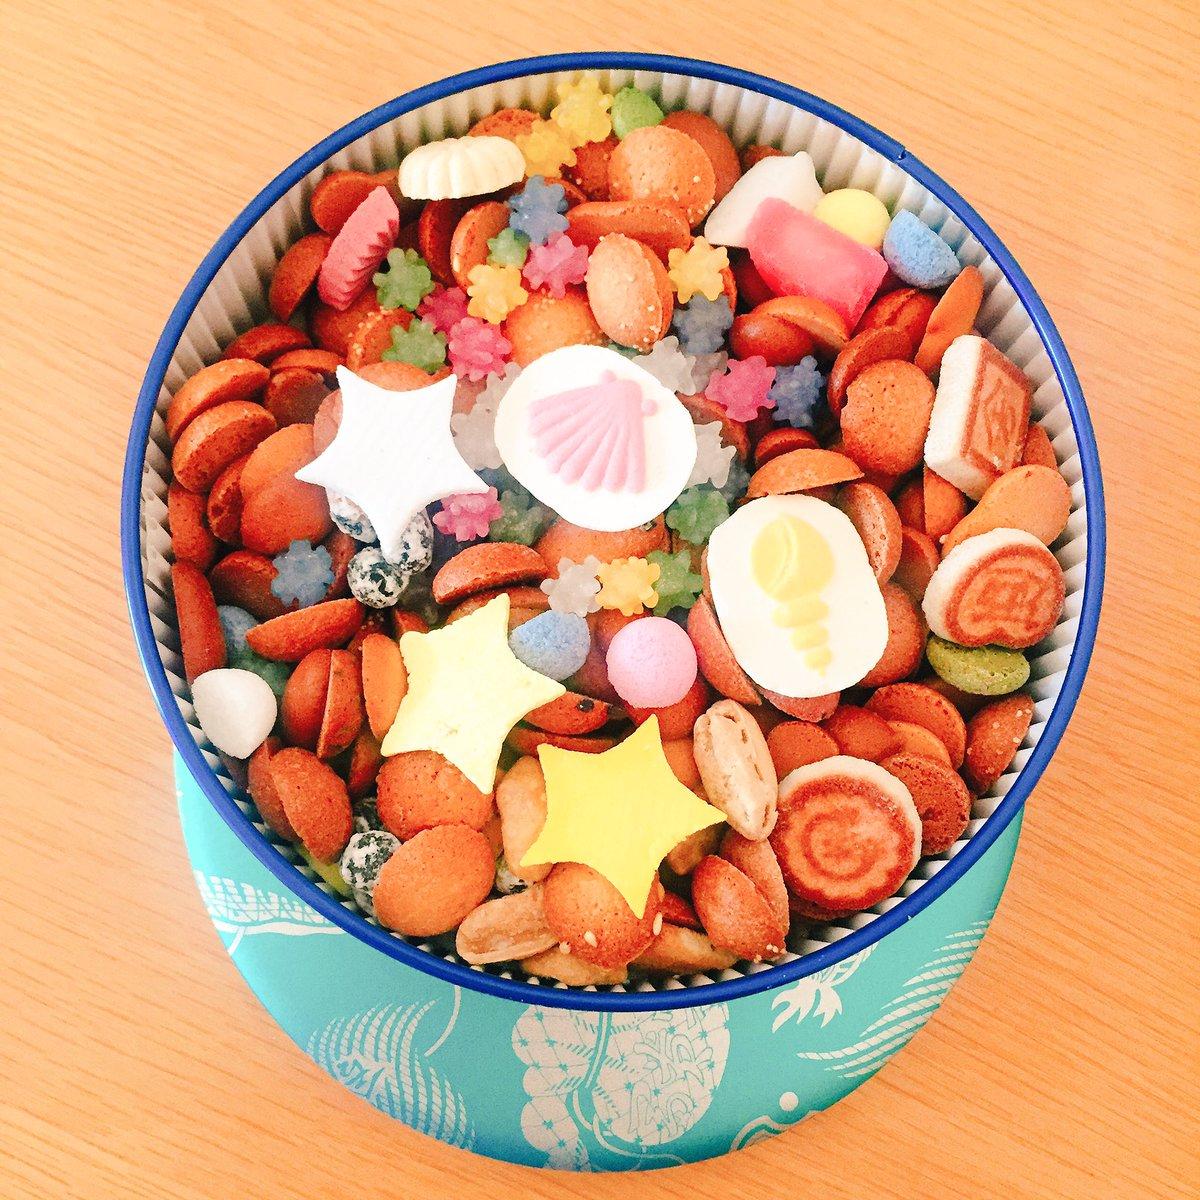 test ツイッターメディア - 冨貴寄っていう和菓子を頂いたんだけど素敵…季節限定の夏色缶というやつだから貝殻とか星モチーフのお菓子入ってて、ひい…可愛い… https://t.co/7vOUNixTIy